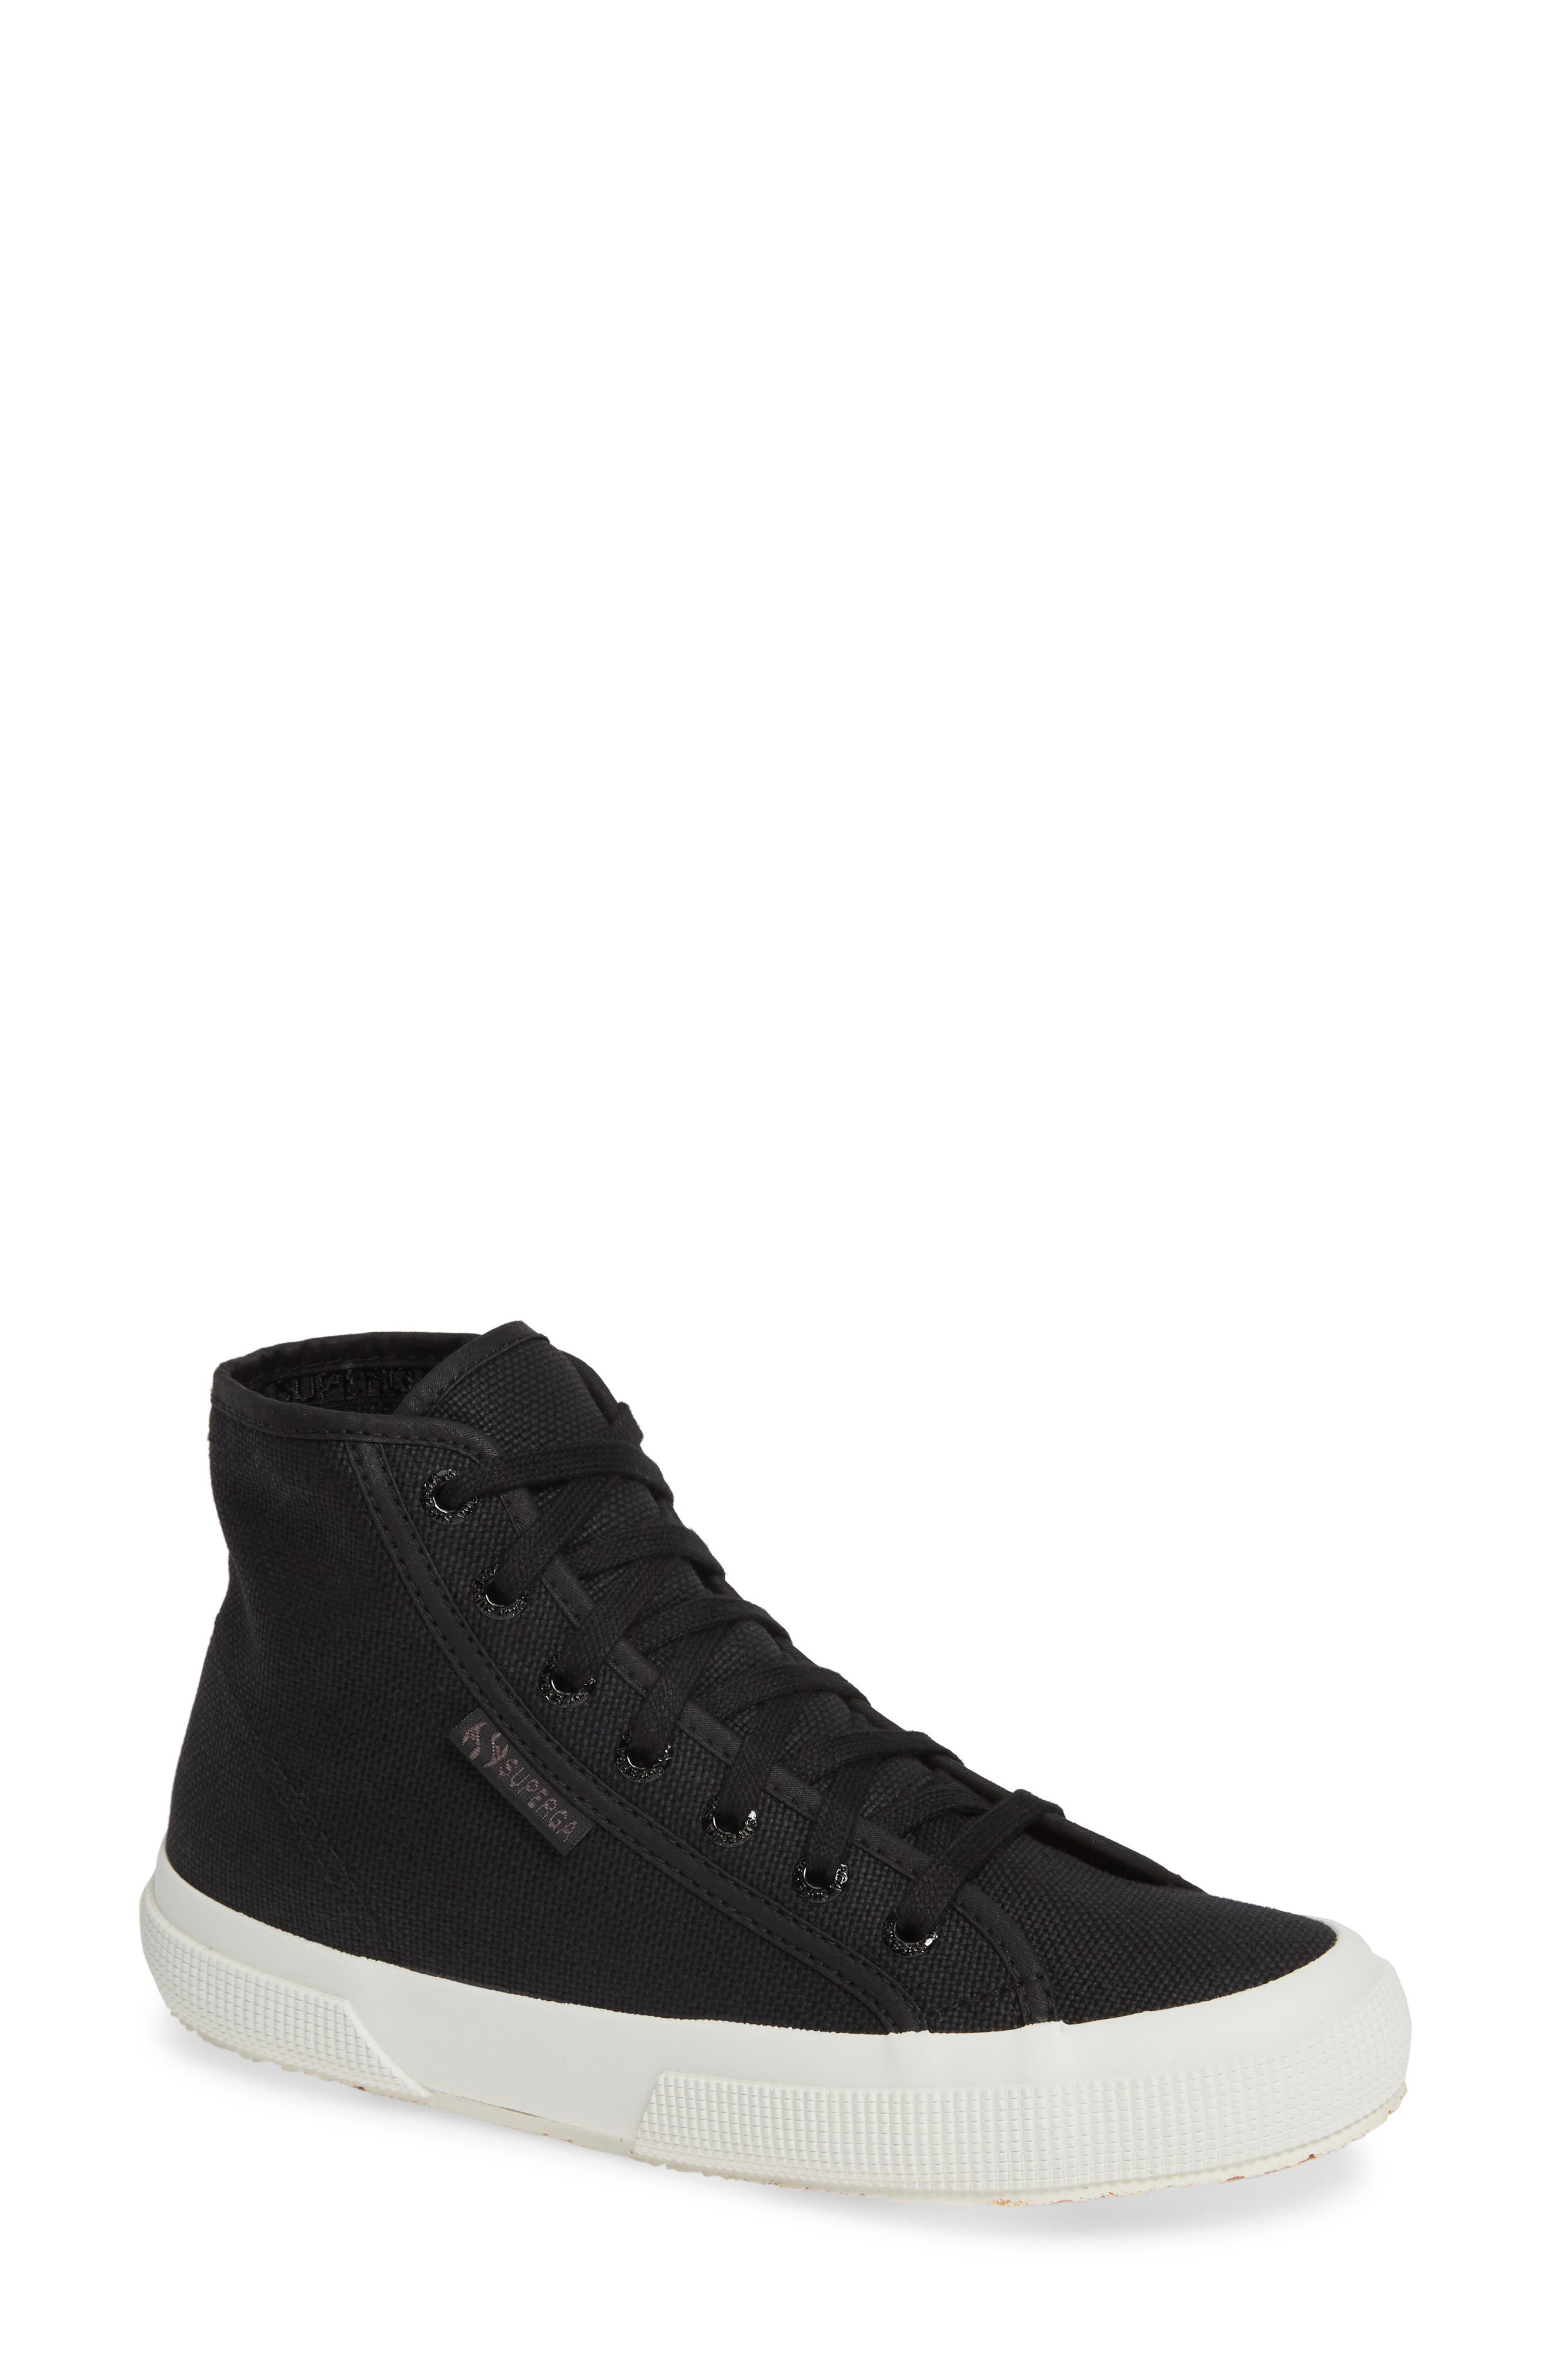 Adidas Originals Green Wm Nmd R2 Pk Sneaker for Men Lyst